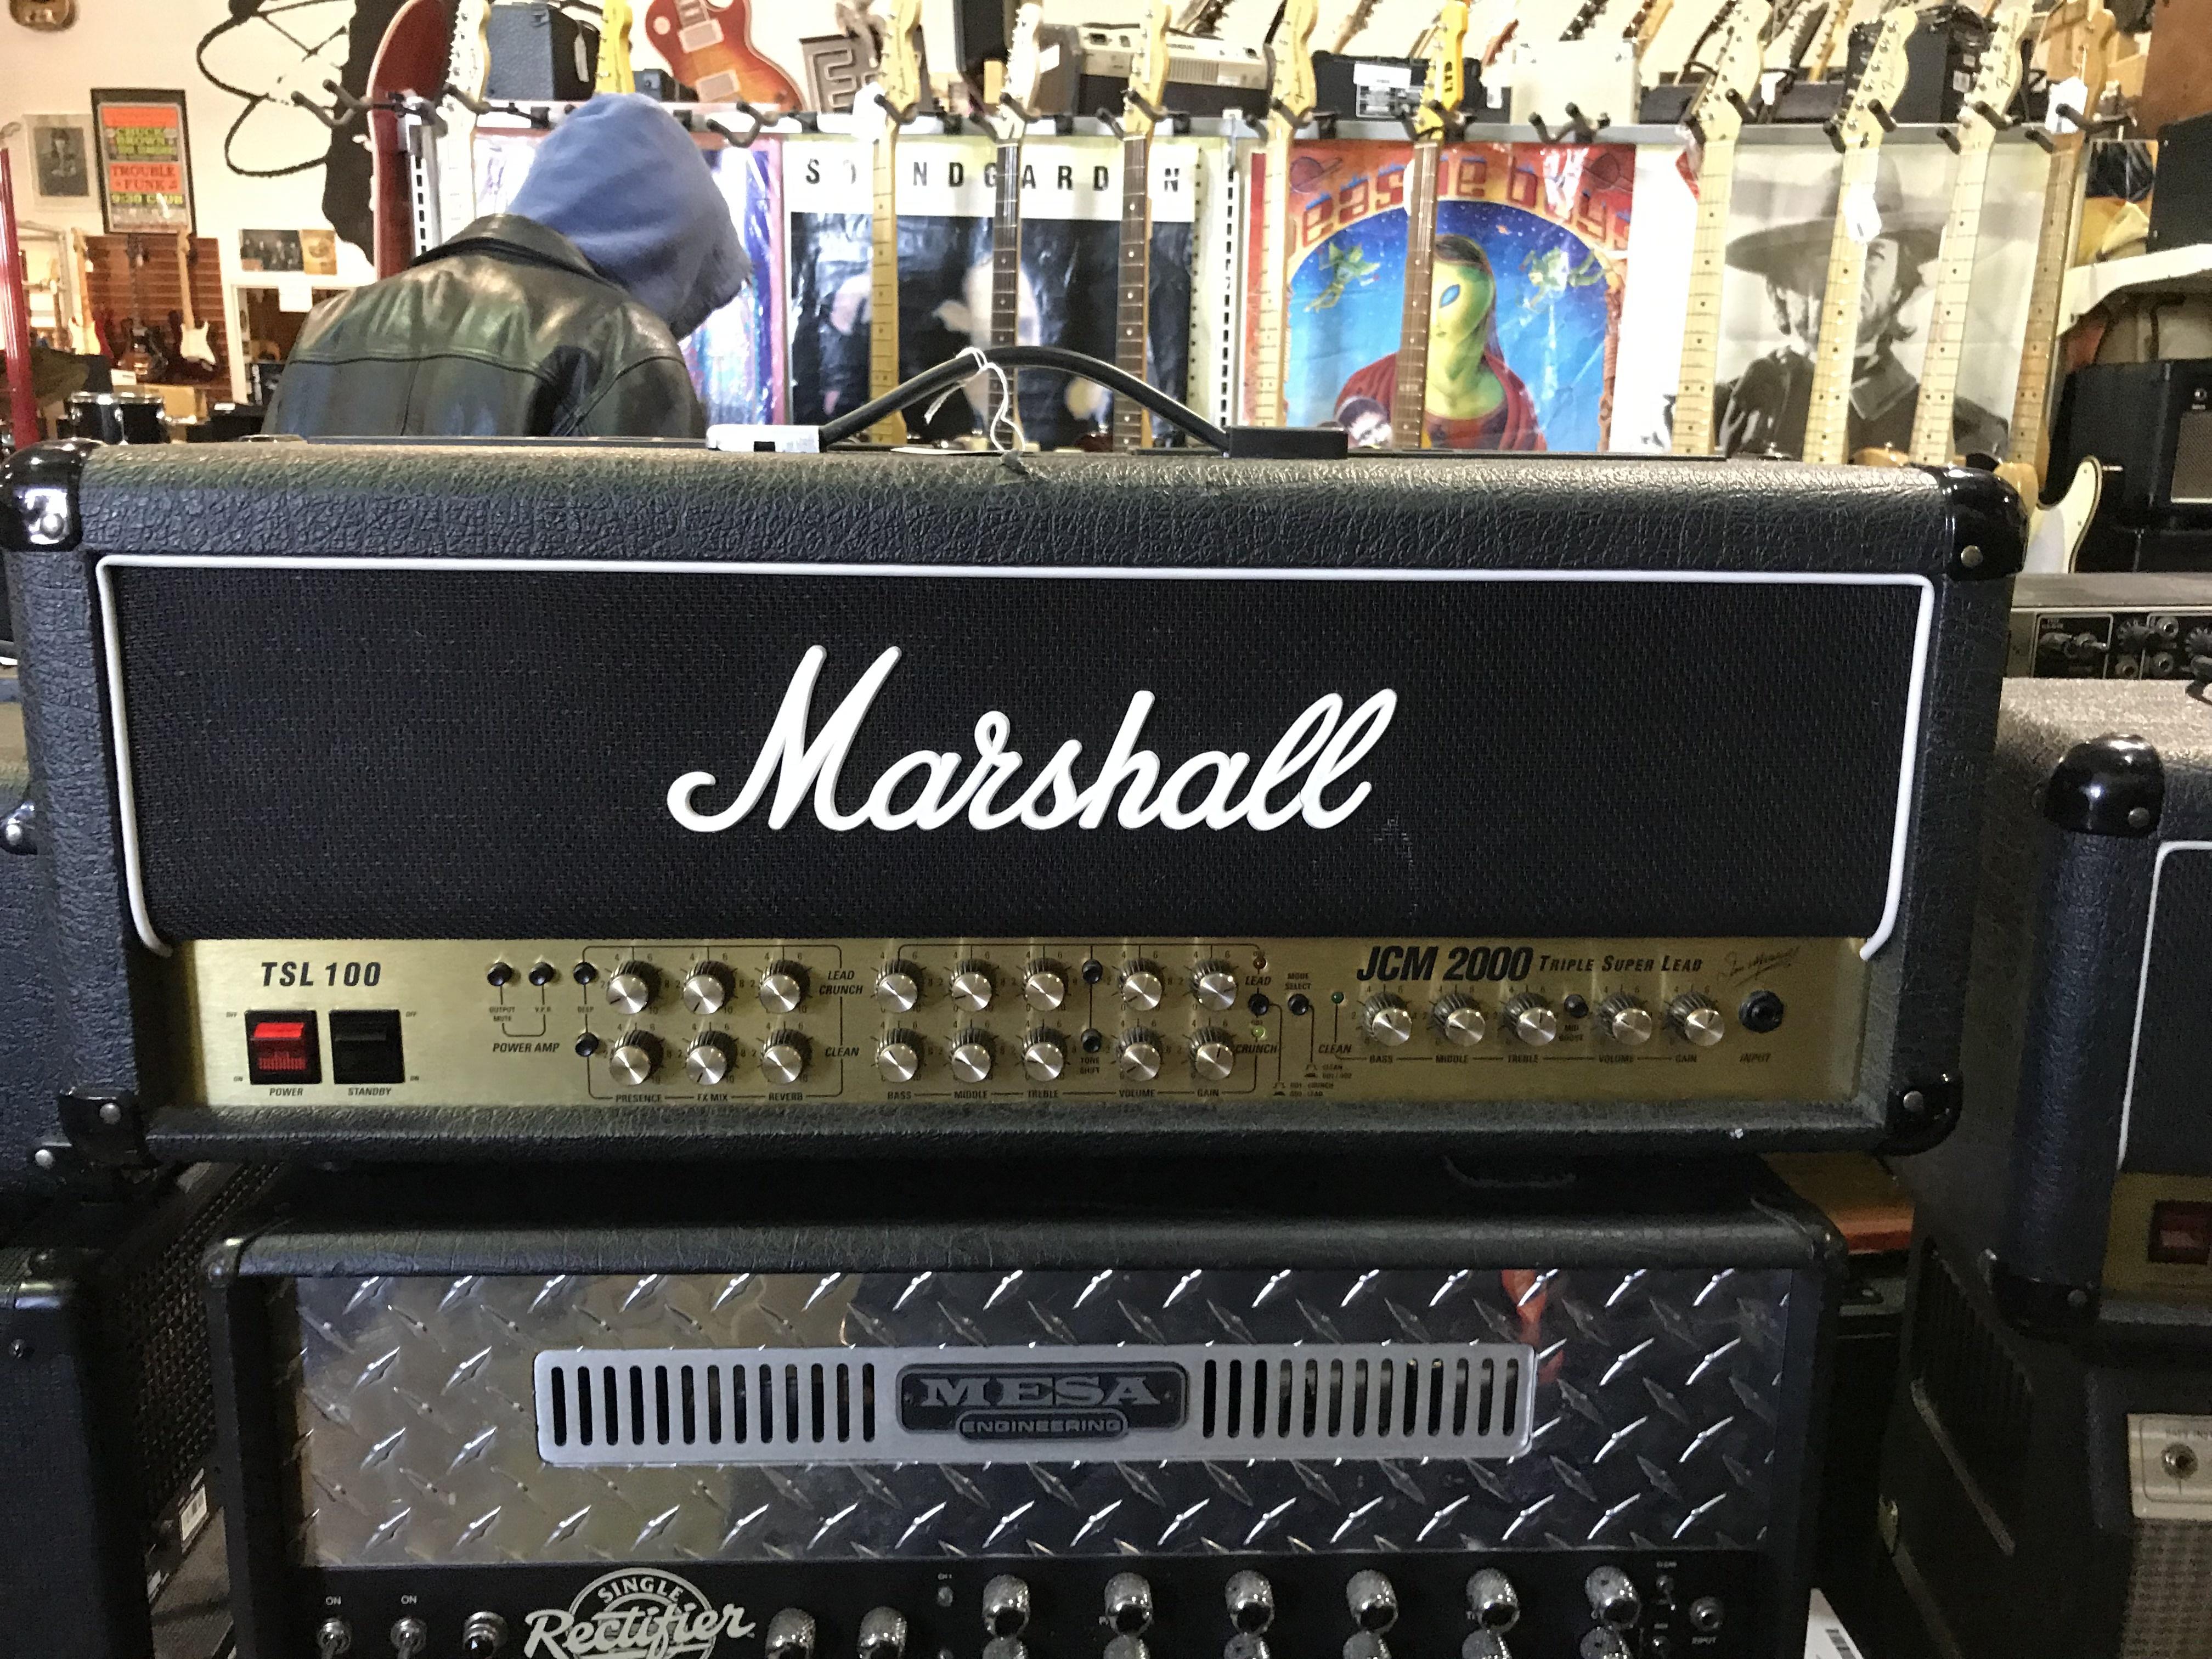 MARSHALL JCM 2000 Triple Super Lead 60W Tube Guitar Amplifier Head